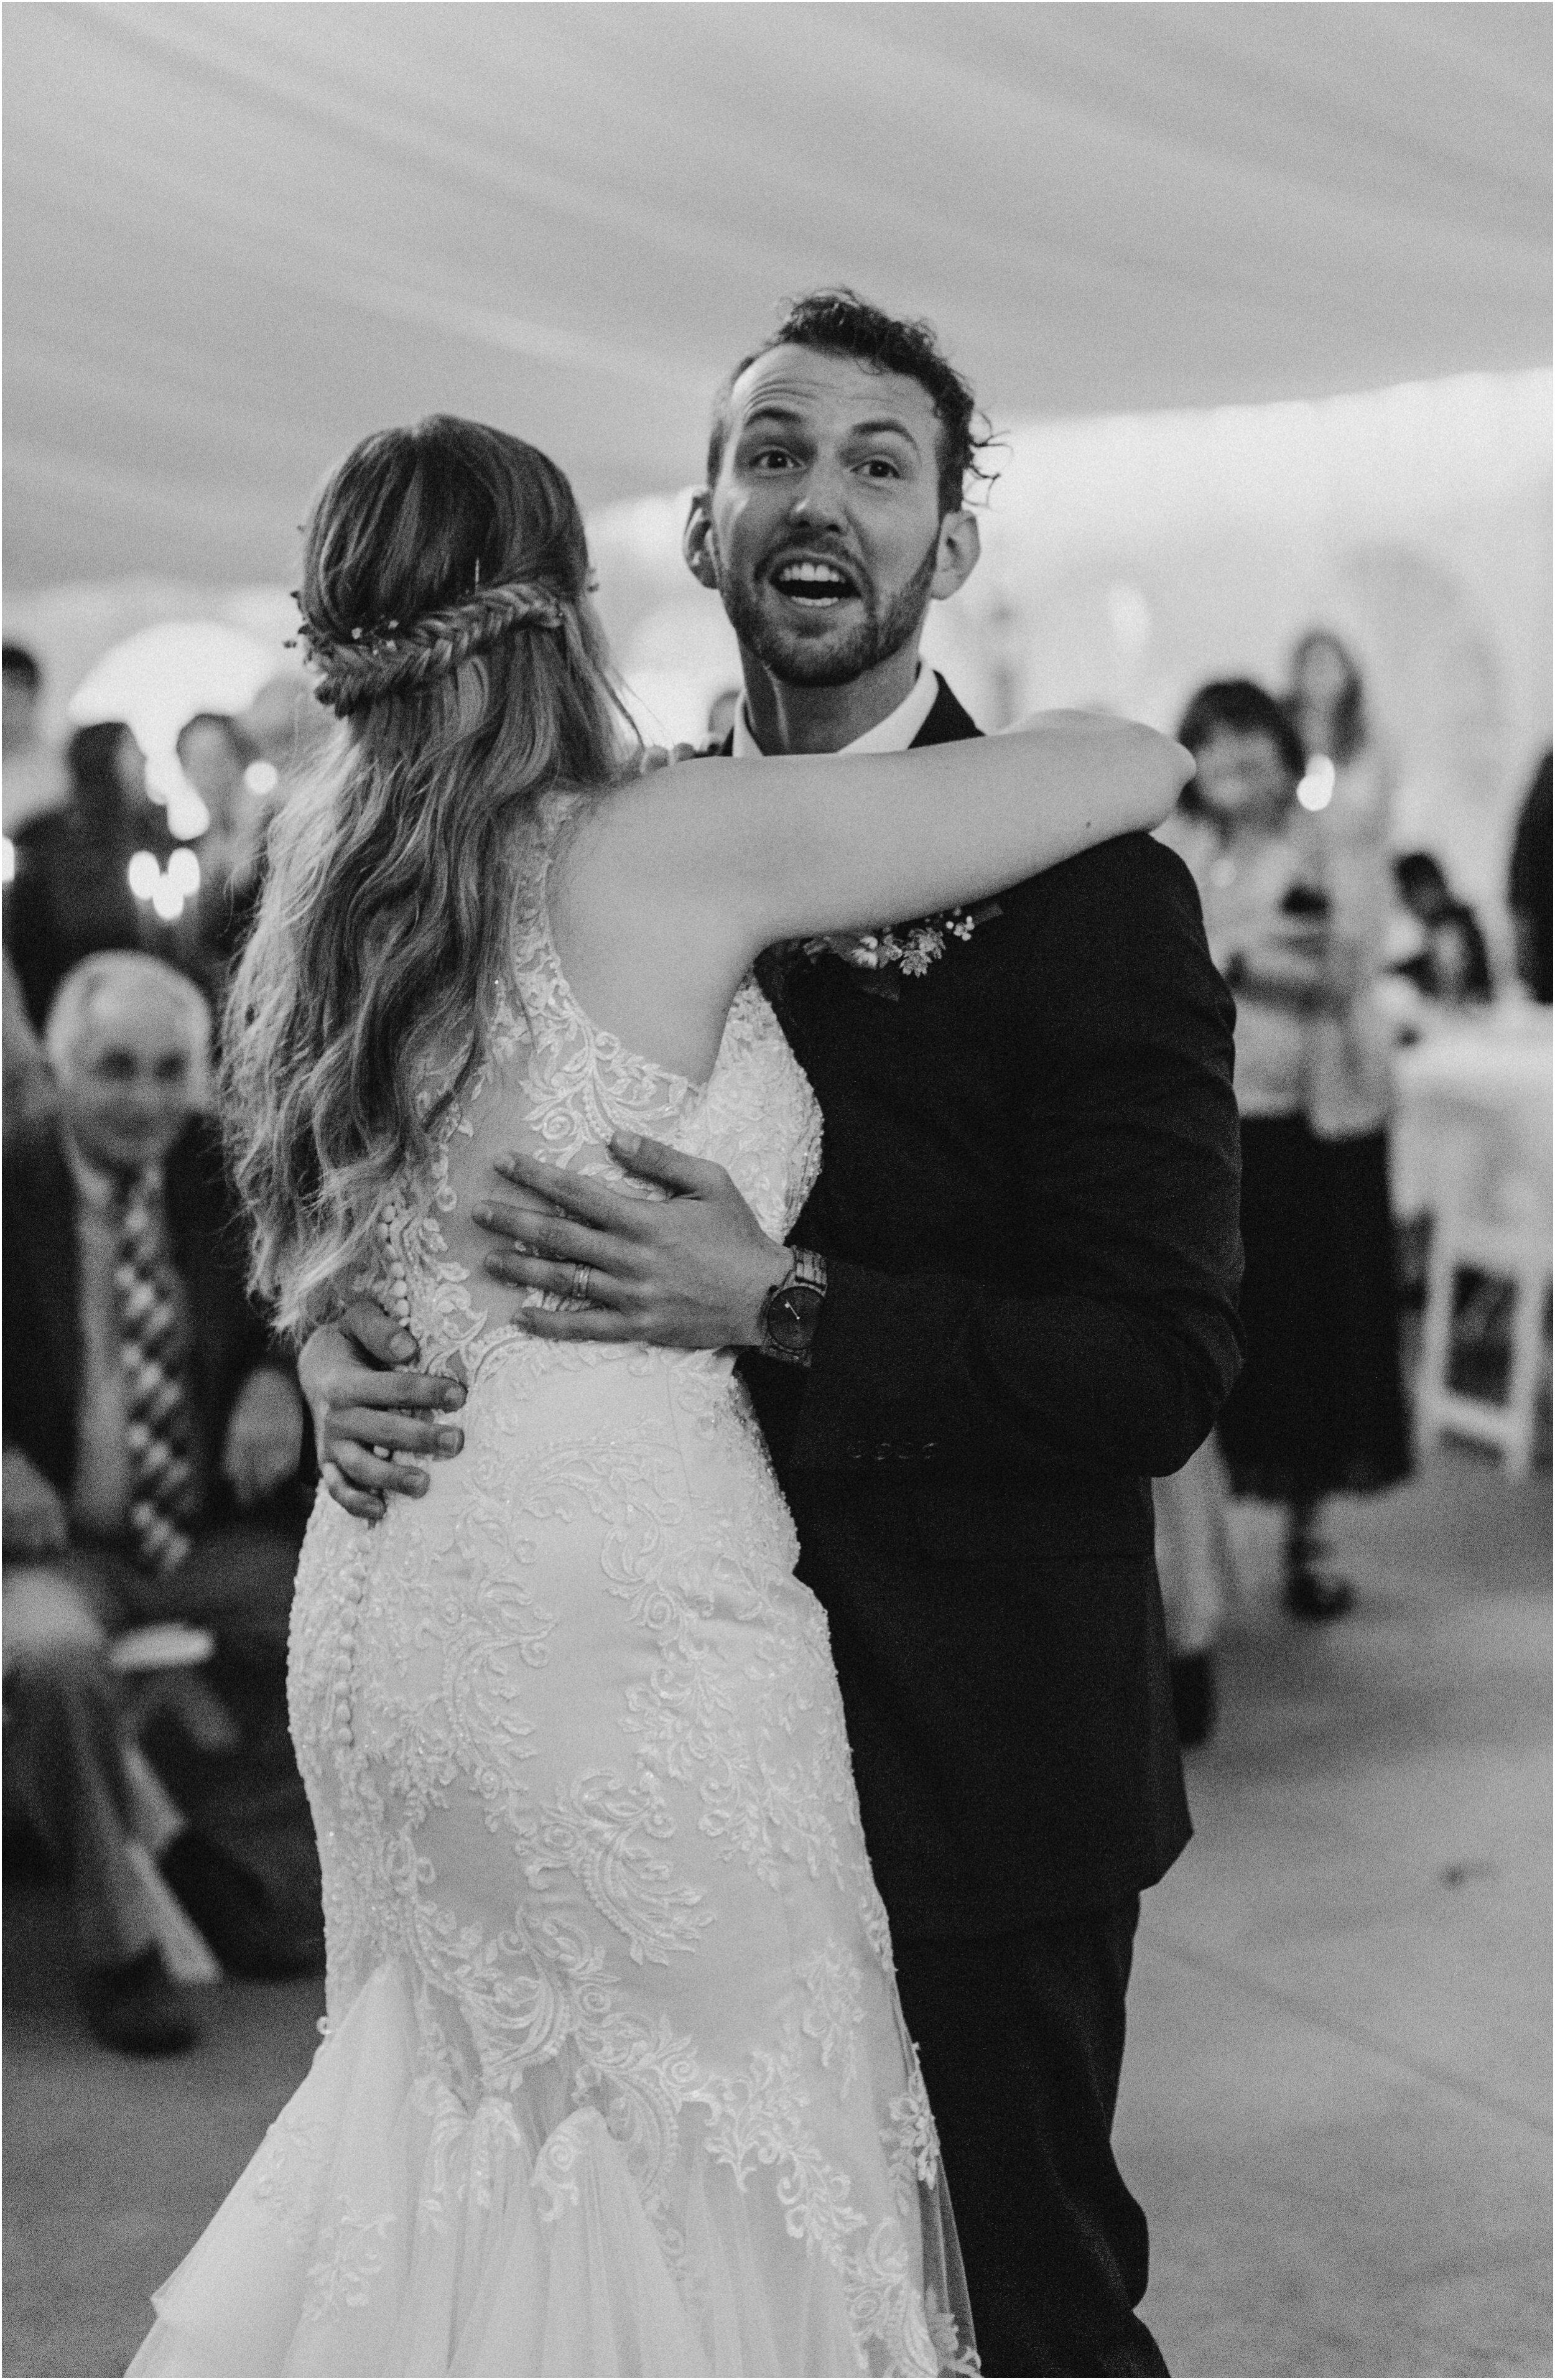 steph-and-jordan-cox-our-wedding-historic-shady-lane-compass-wedding-collective-hazel-lining-photography-destination-elopement-wedding-engagement-photography_0085.jpg